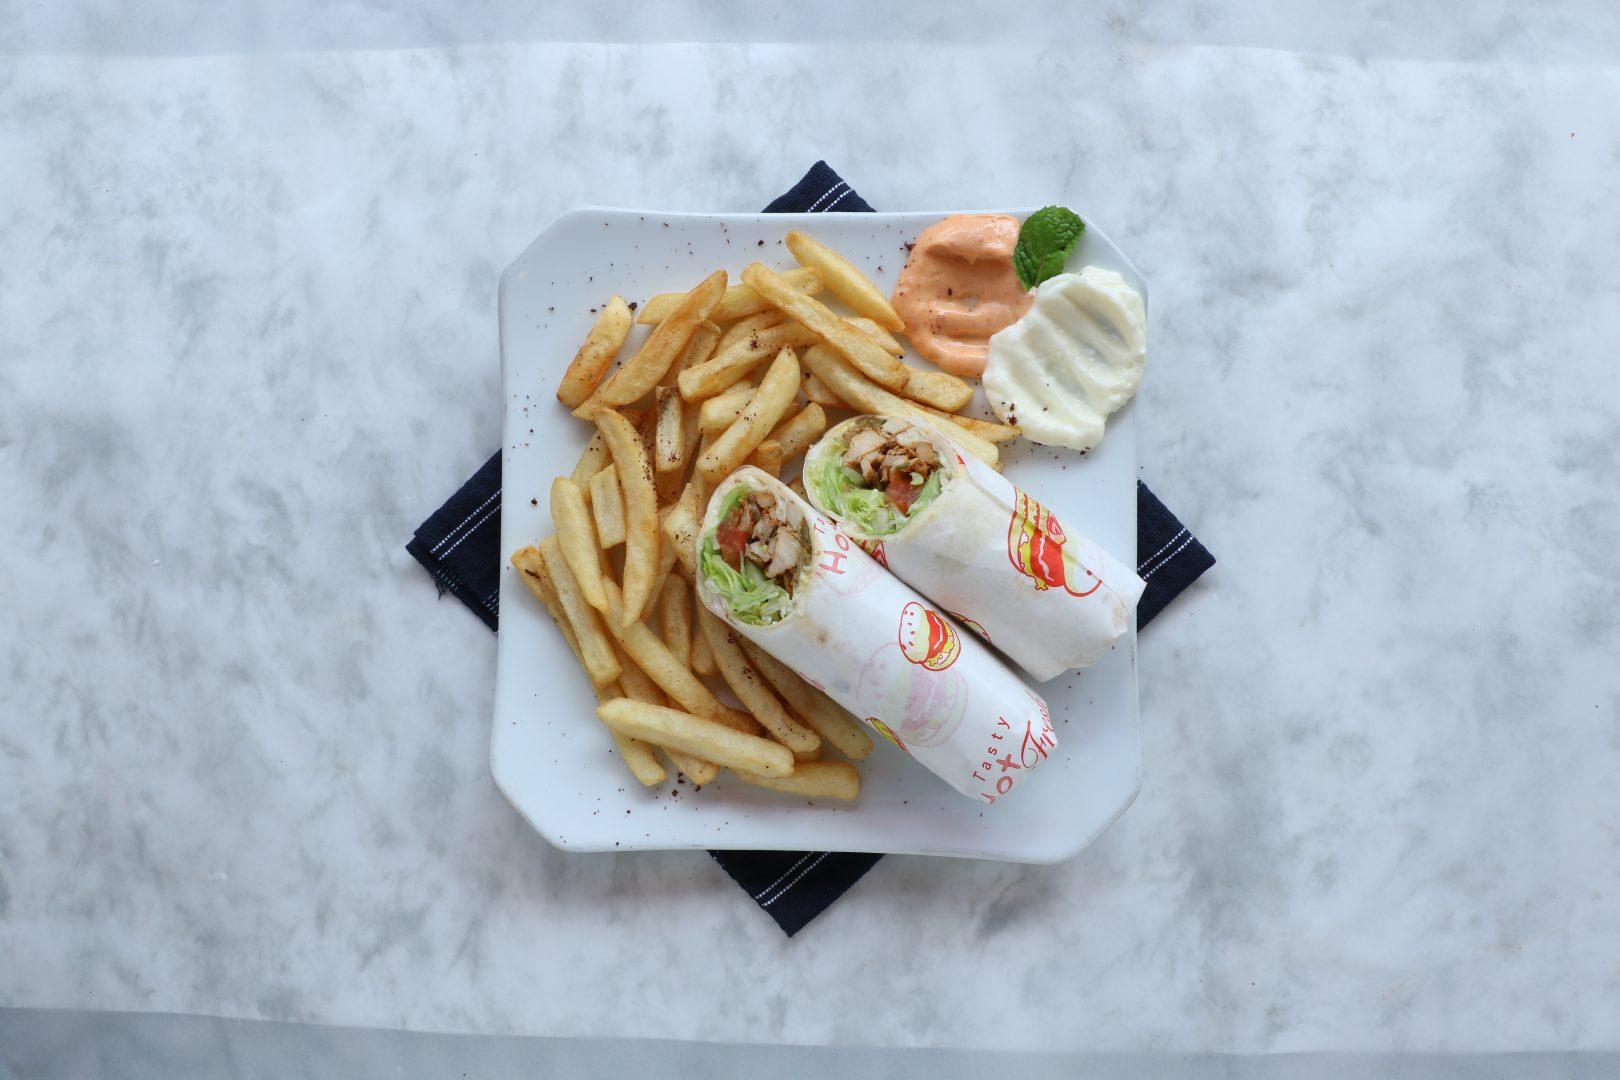 Chicken Shawarma Byblos Grill